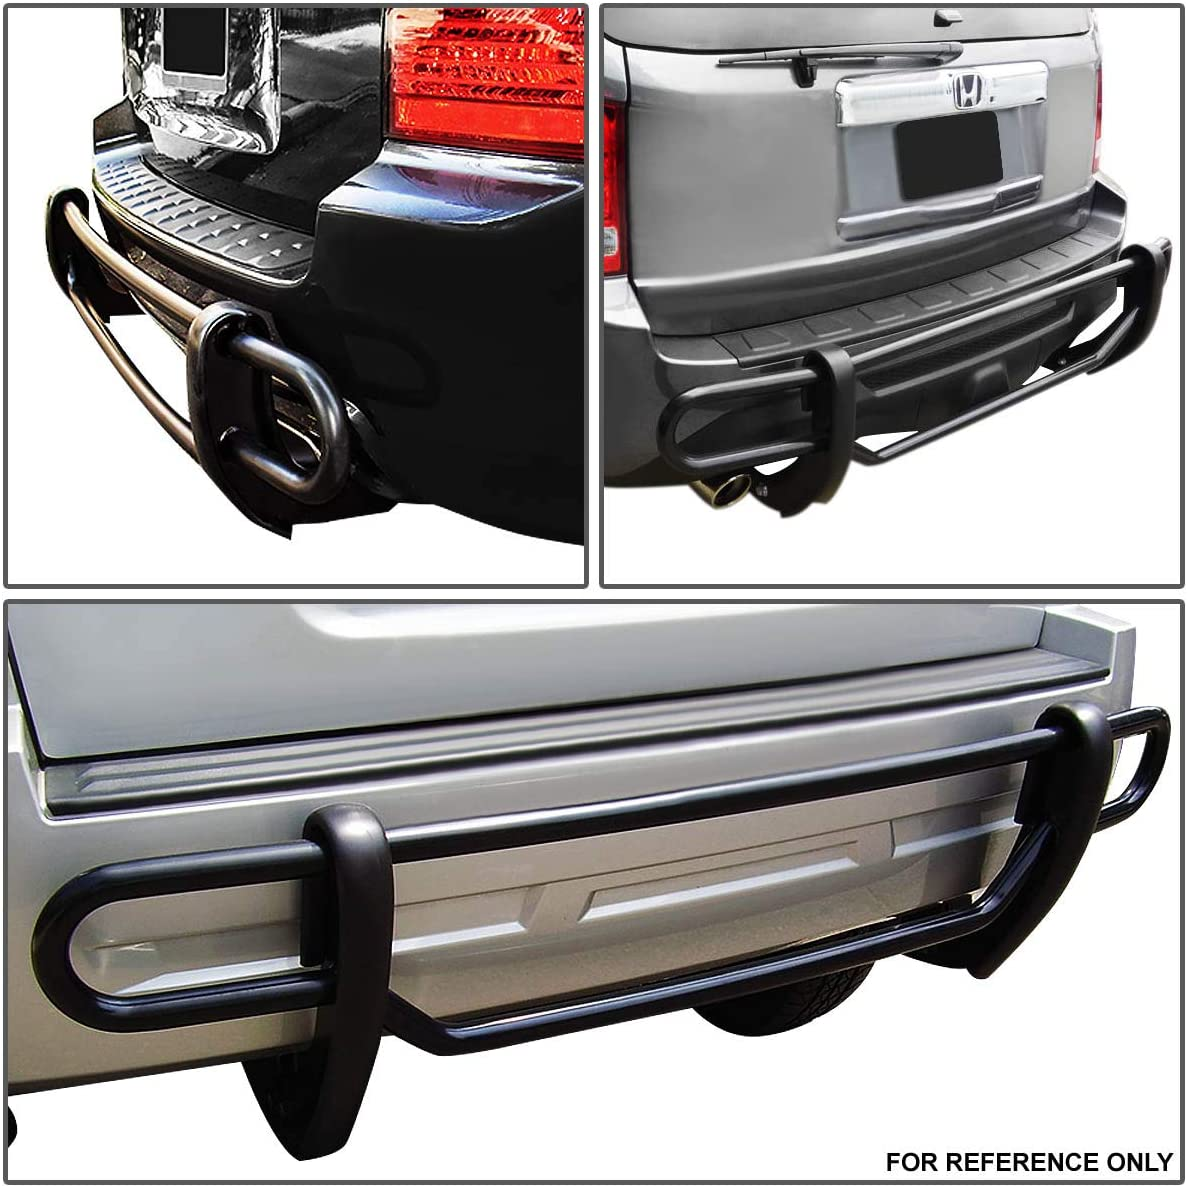 DNA MOTORING RBG-021-BK Rear Bumper Protector Guard Fit 98-05 Benz ML320 ML350 ML430 ML500 Black